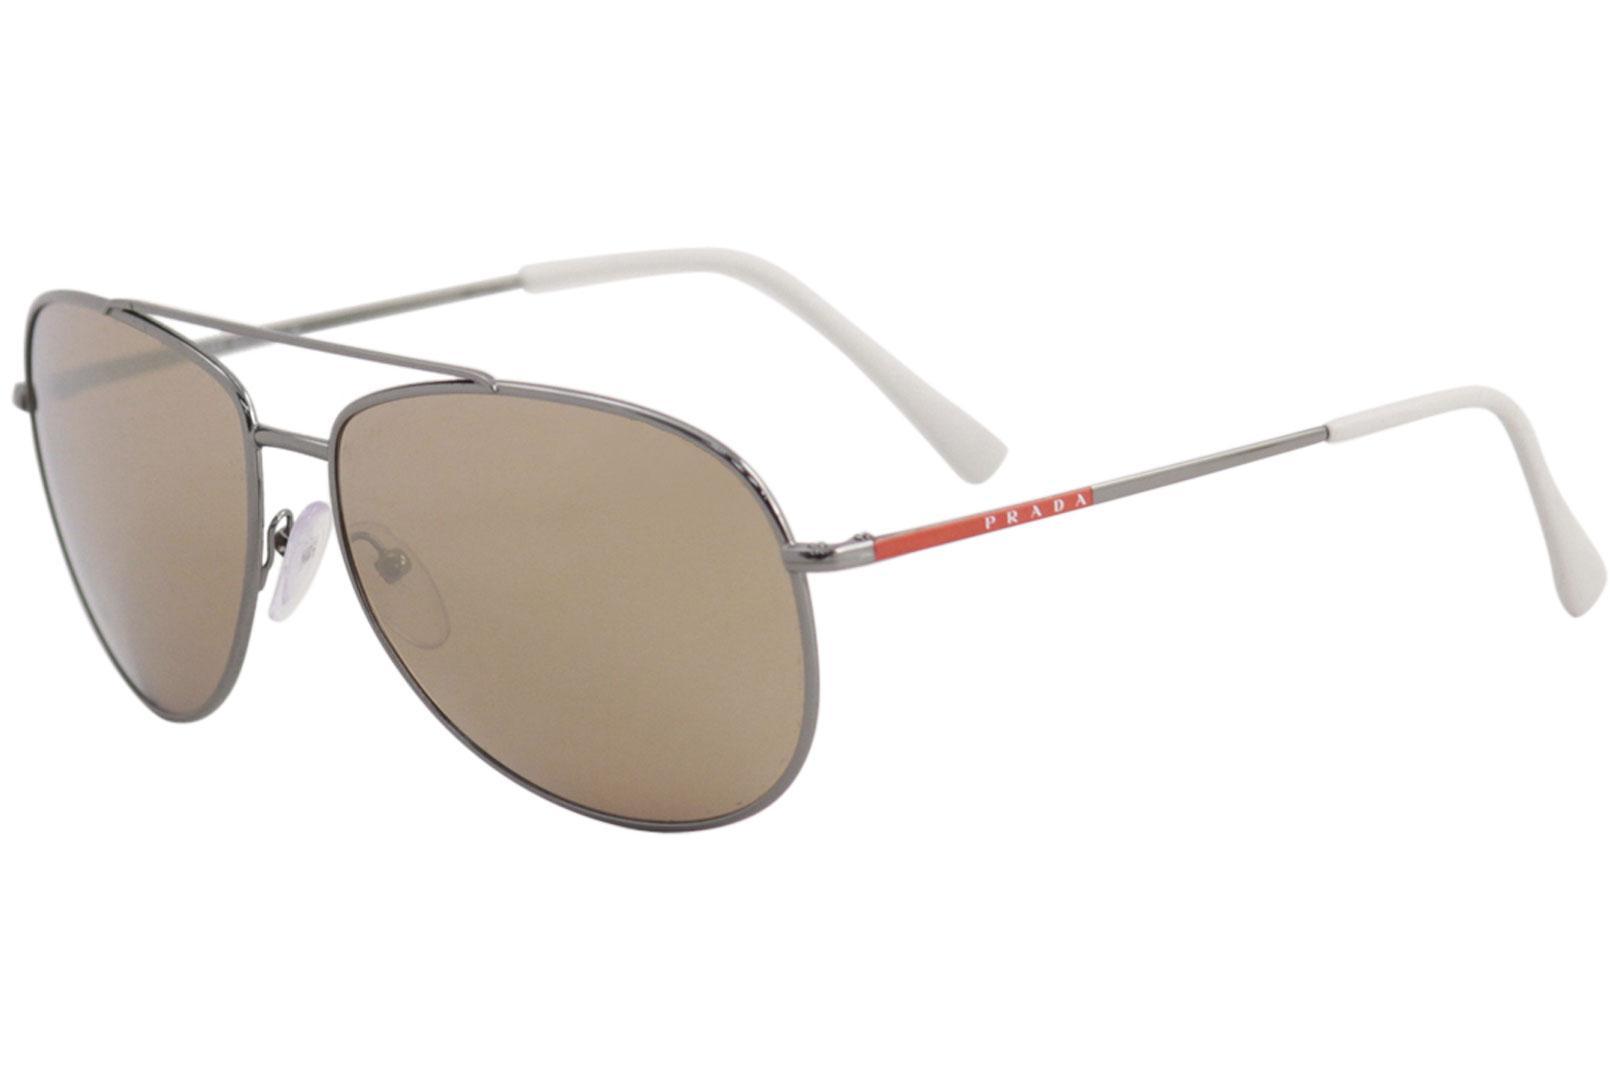 e4f1ef00c695 Prada Men s Linea Rossa SPS55U SPS 55 U Fashion Pilot Sunglasses